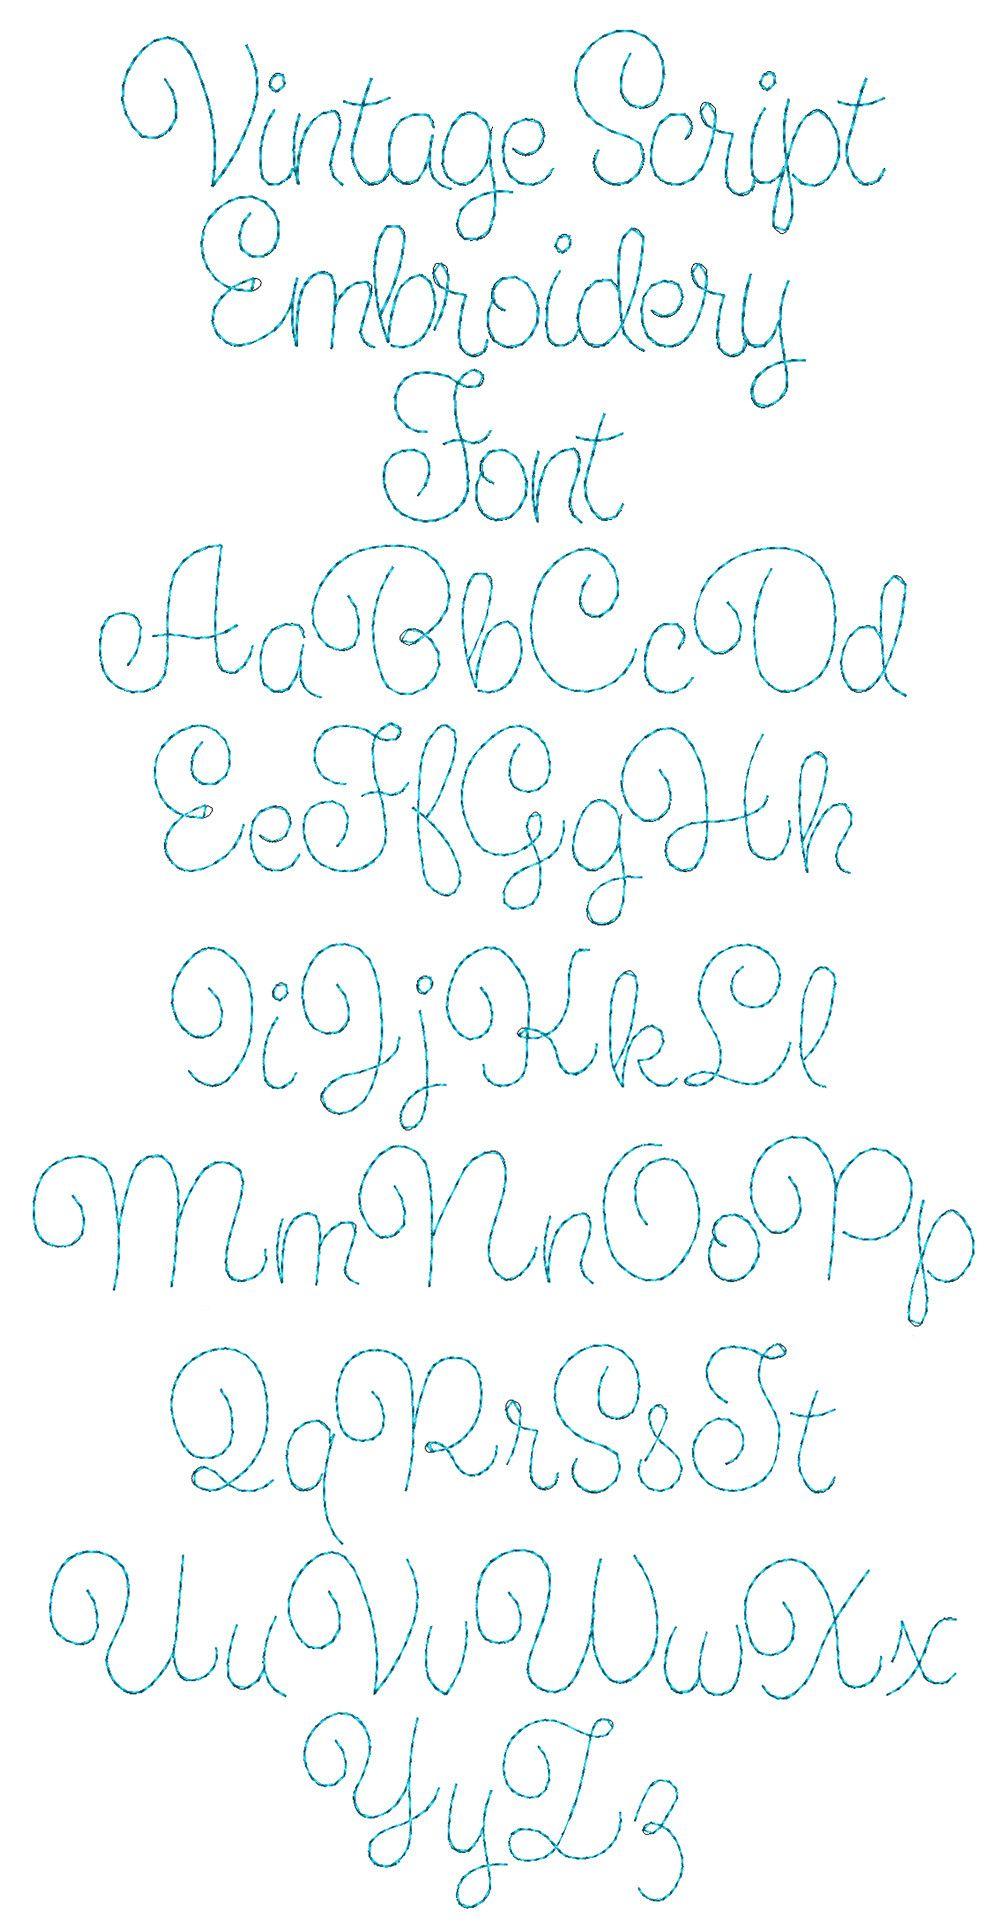 Vintage Script Font Hand Embroidery Letters Hand Embroidery Patterns Free Machine Embroidery Patterns